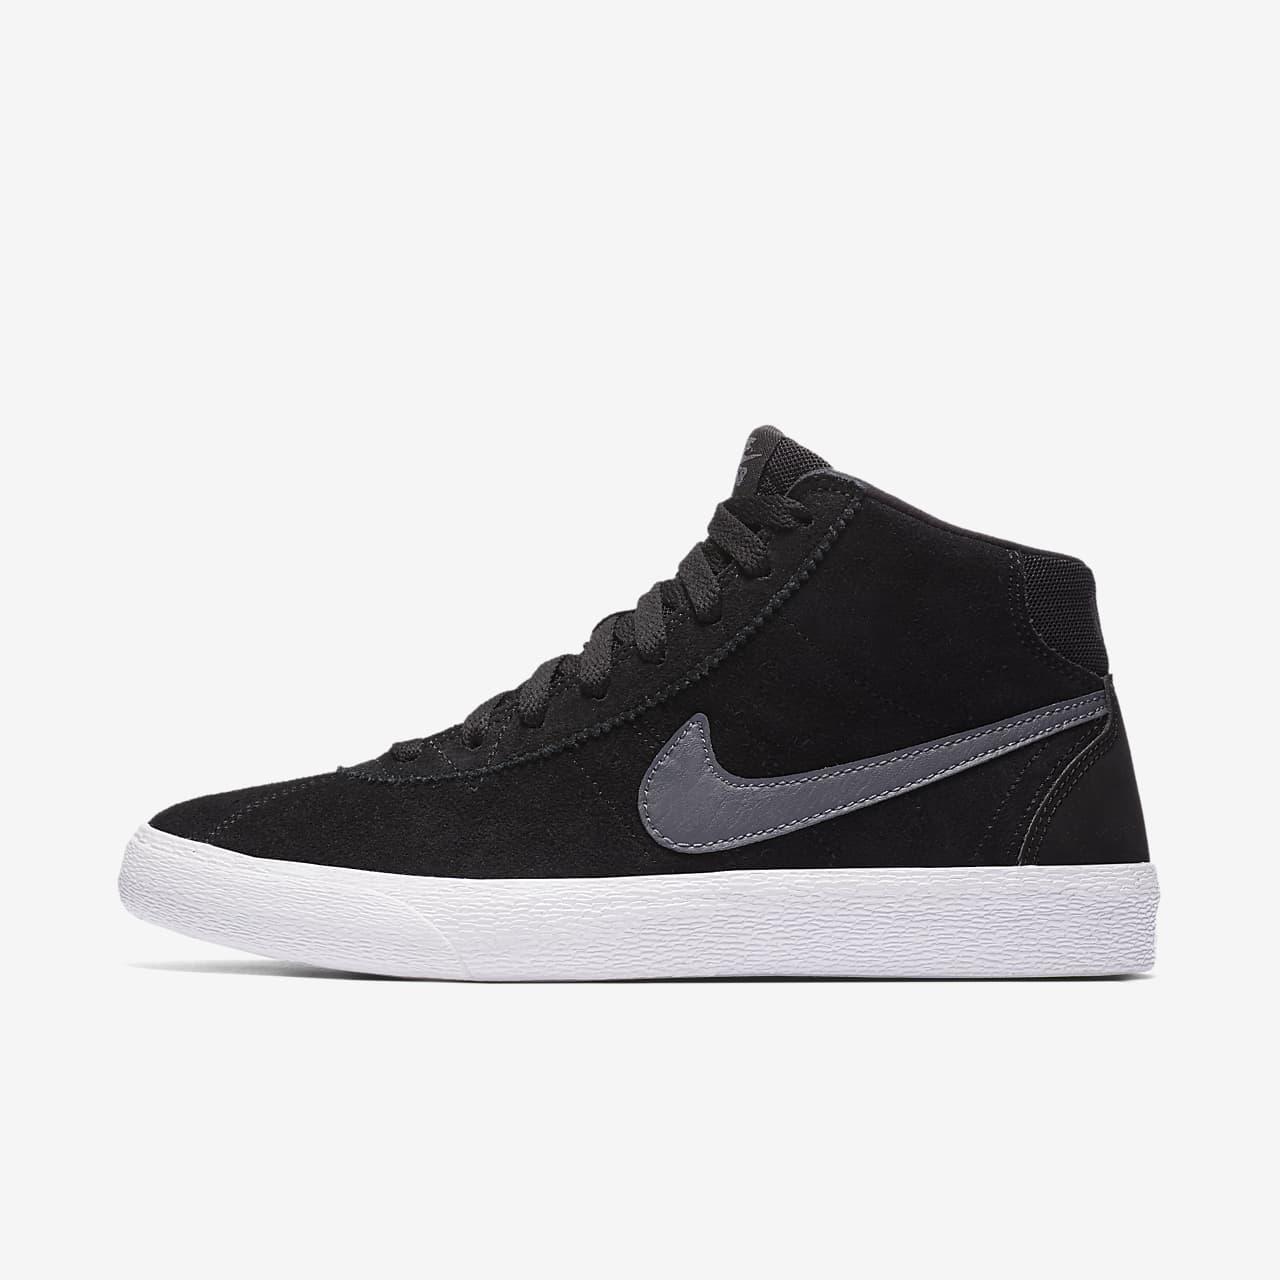 Nike SB Bruin High Skate Shoe